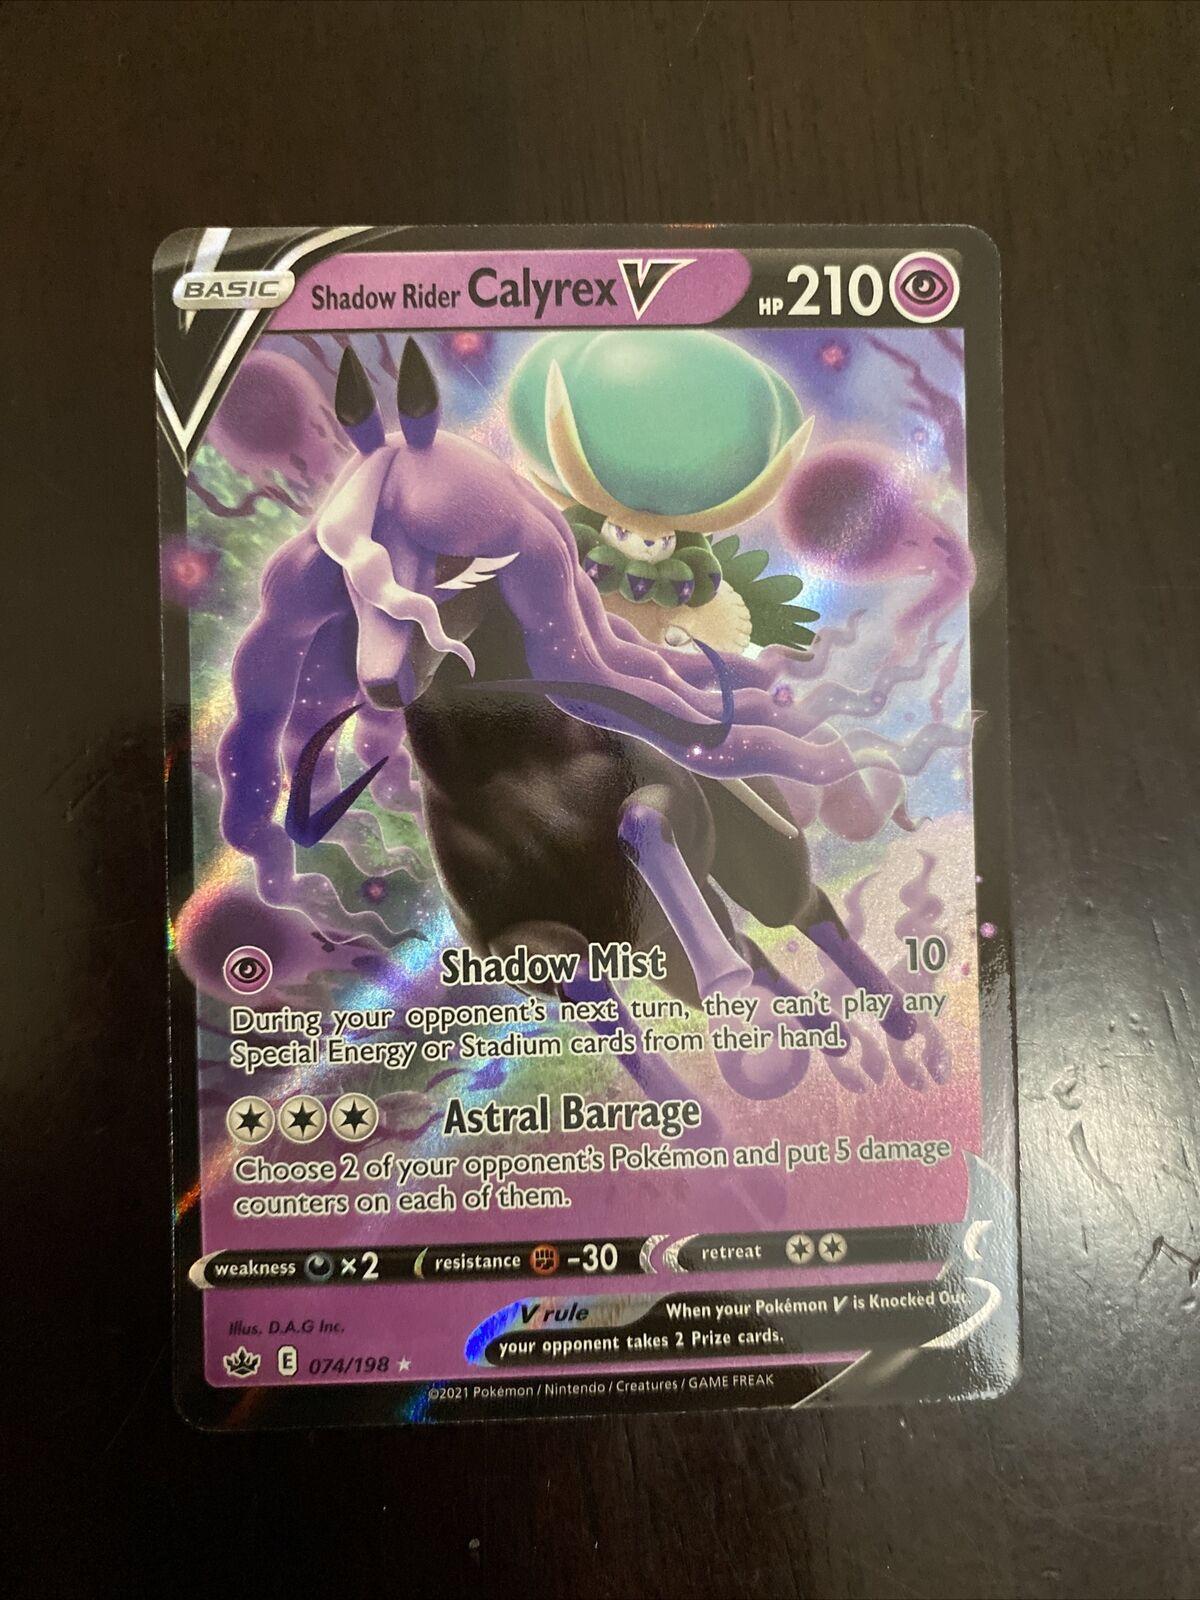 Pokemon Chilling Reign Shadow Rider Calyrex V 074/198